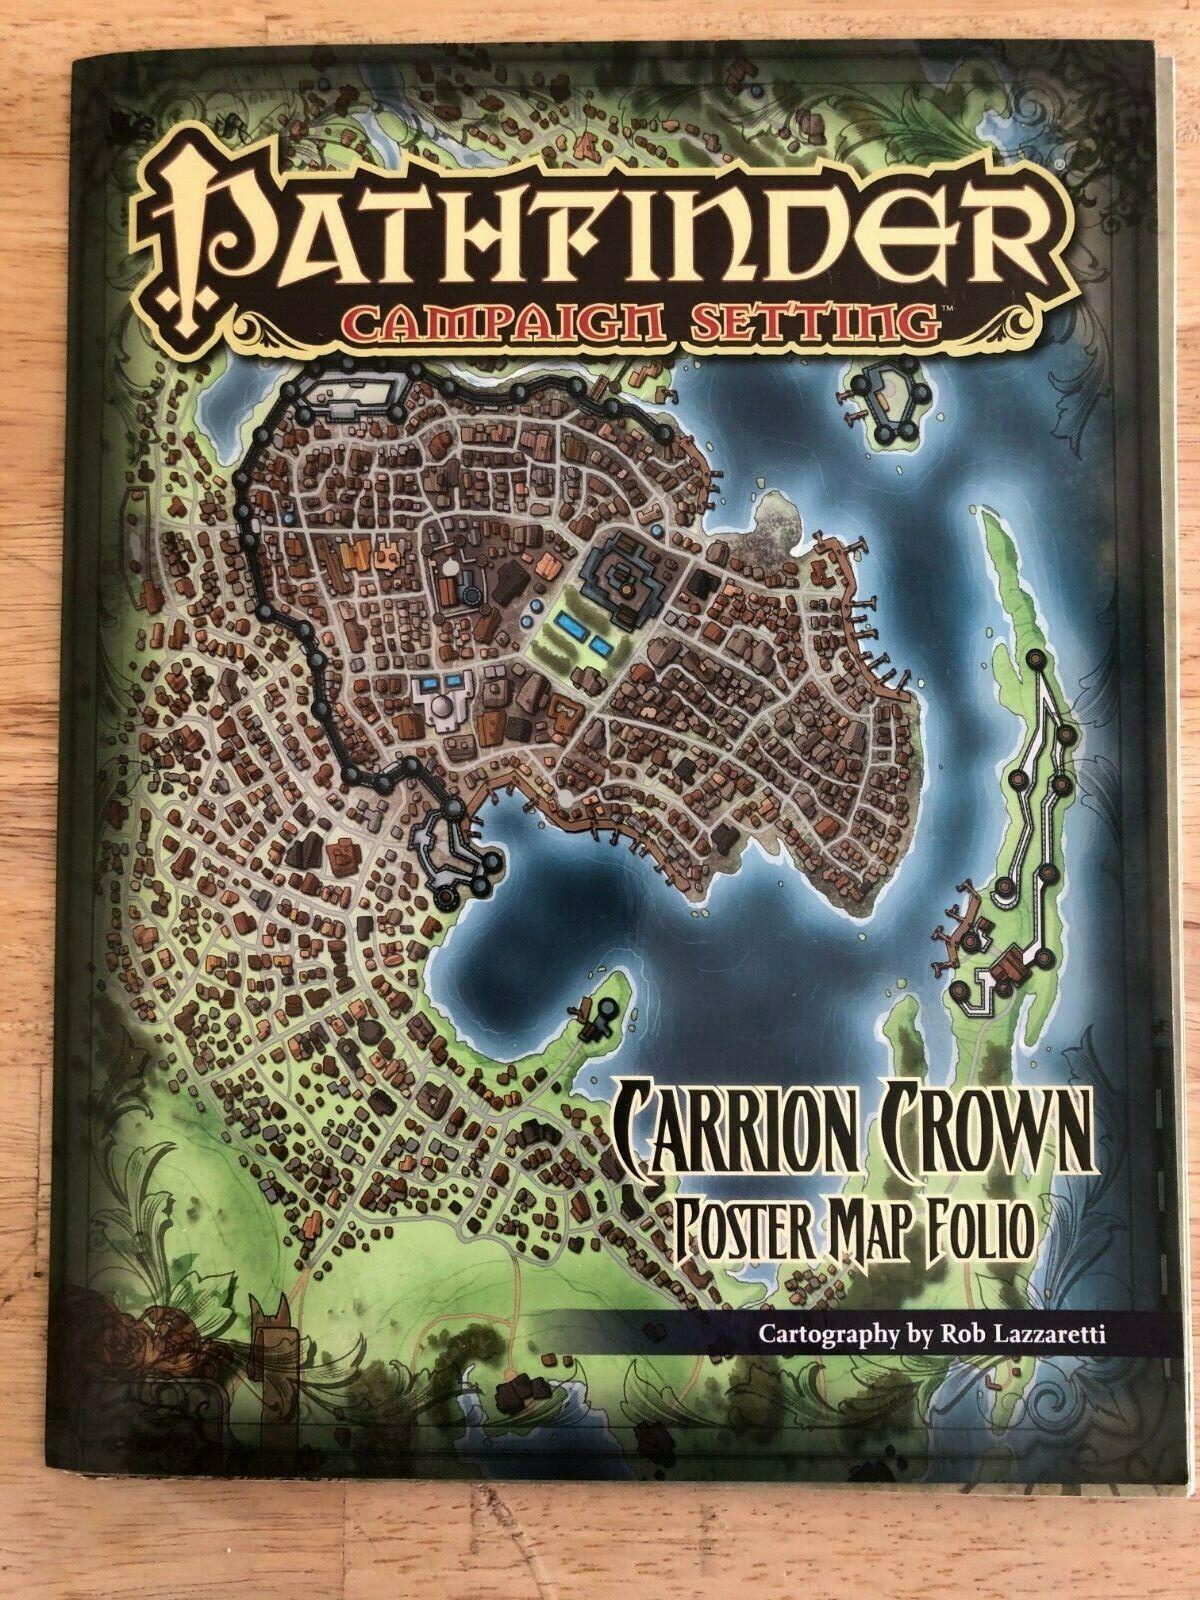 Pathfinder Inner Sea Poster Map Folio Pzo9228 For Sale Online Ebay